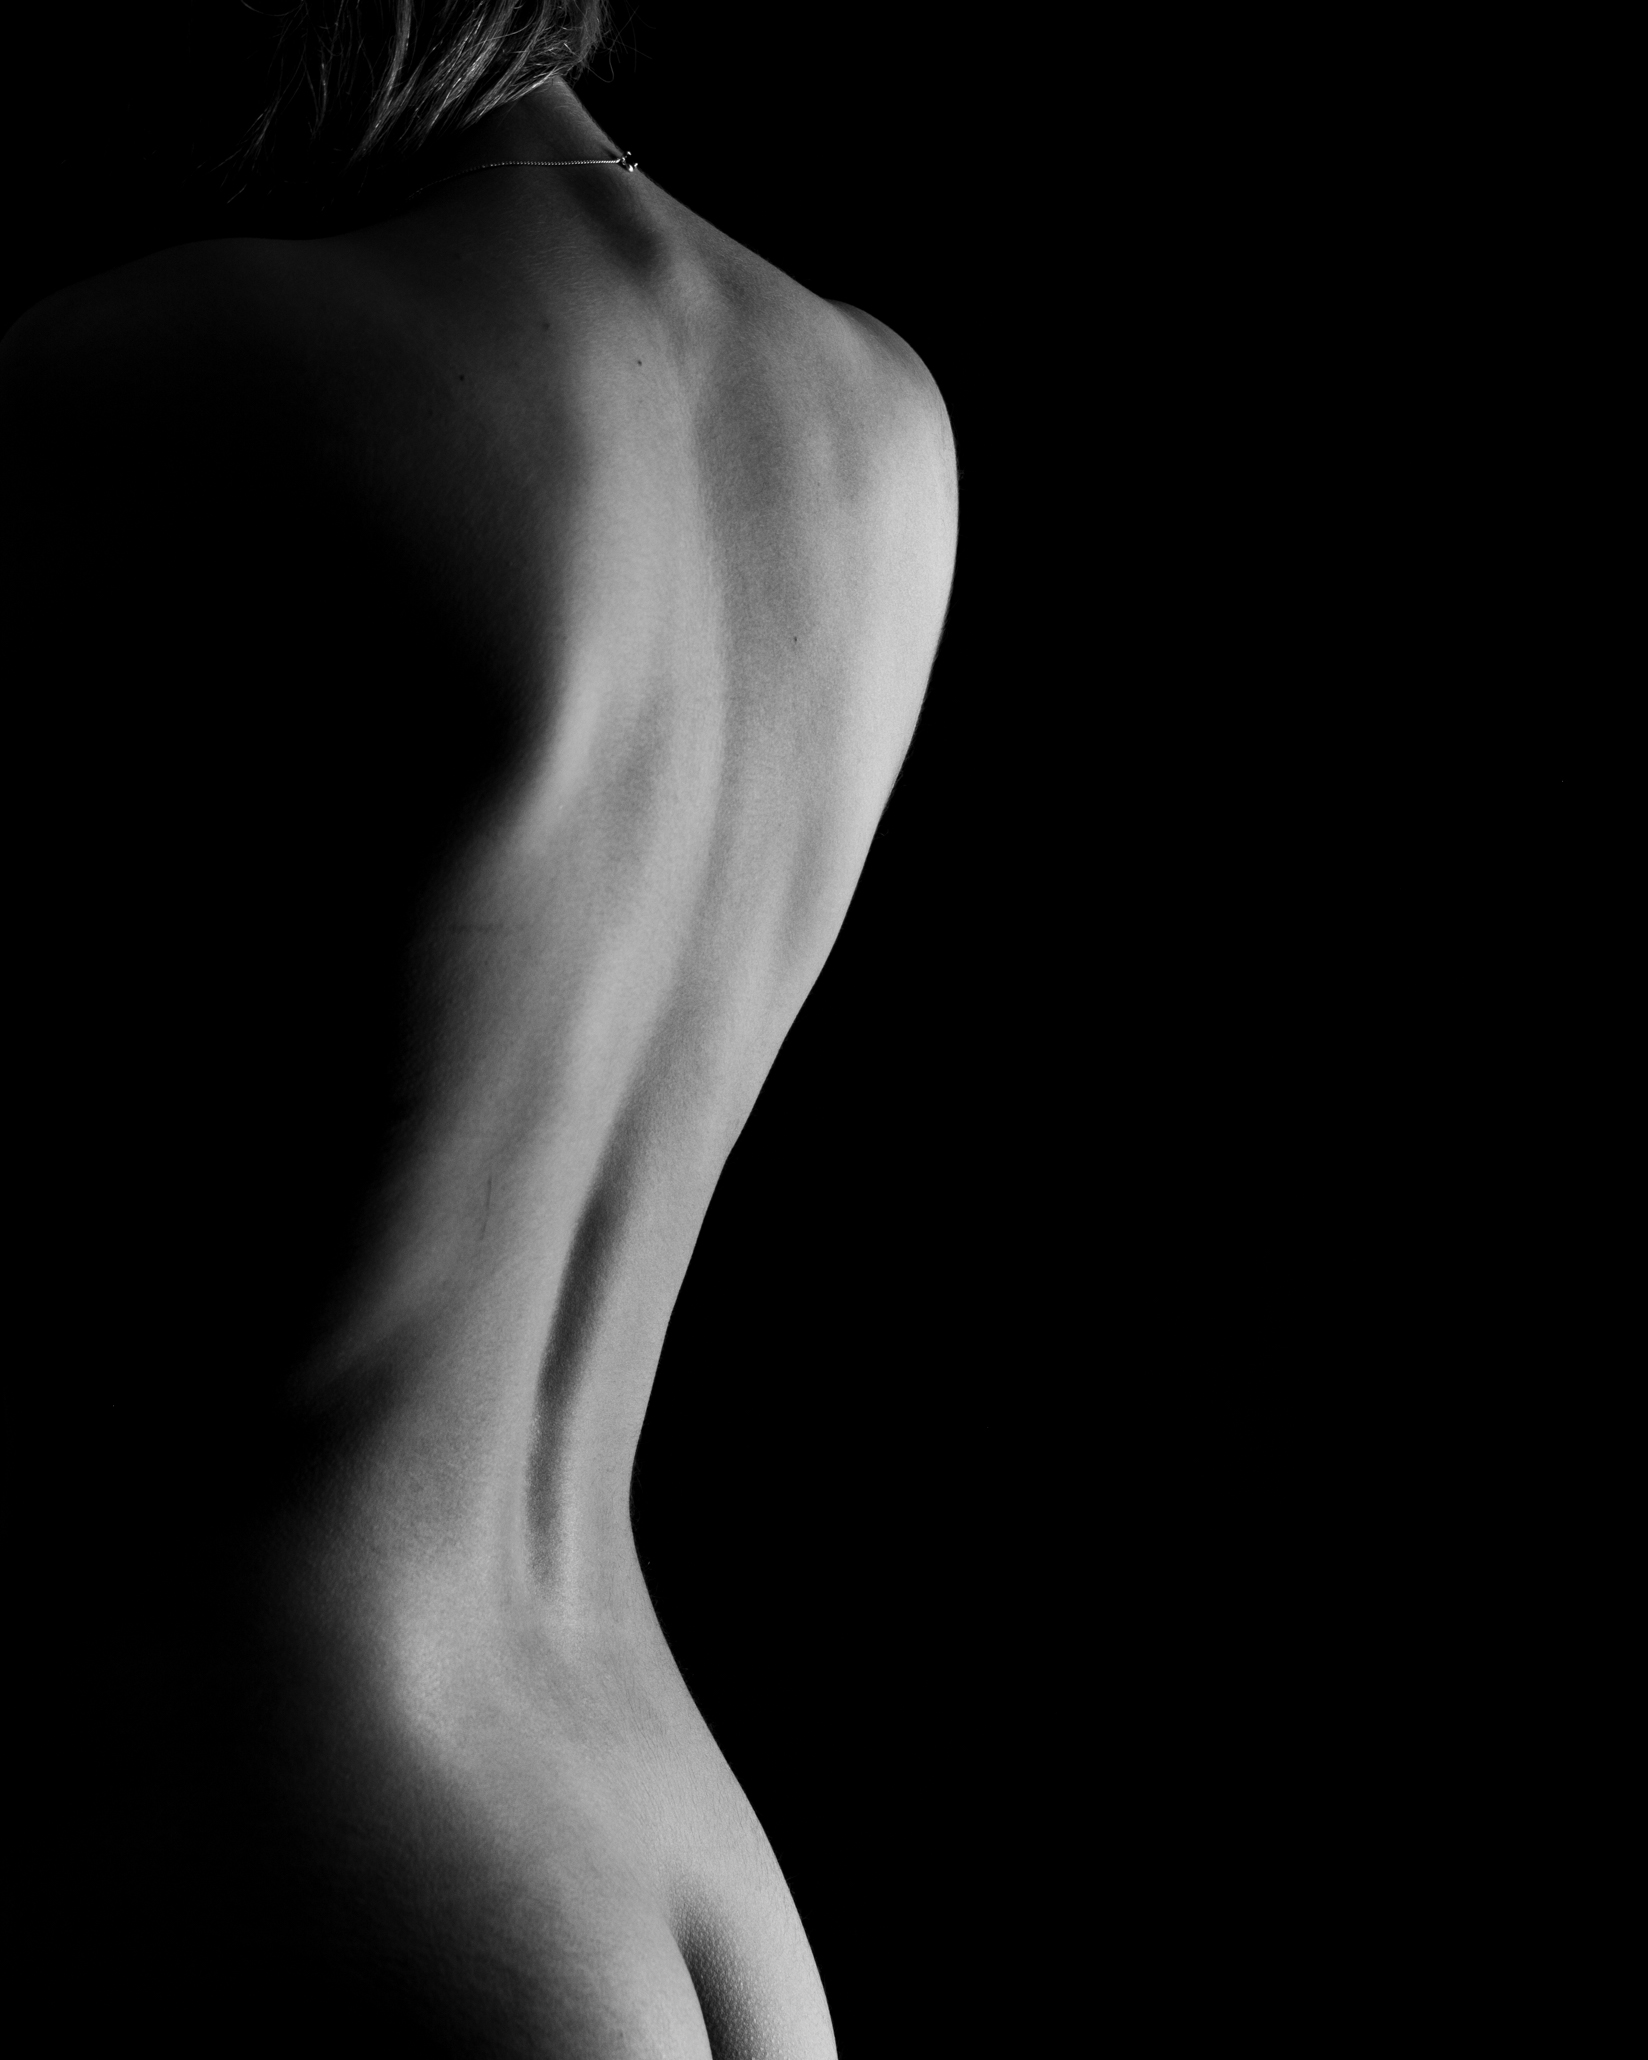 Tomada en foto estudio en taller de desnudo artistico. Fotografo: cesar rosales modelo: eV.